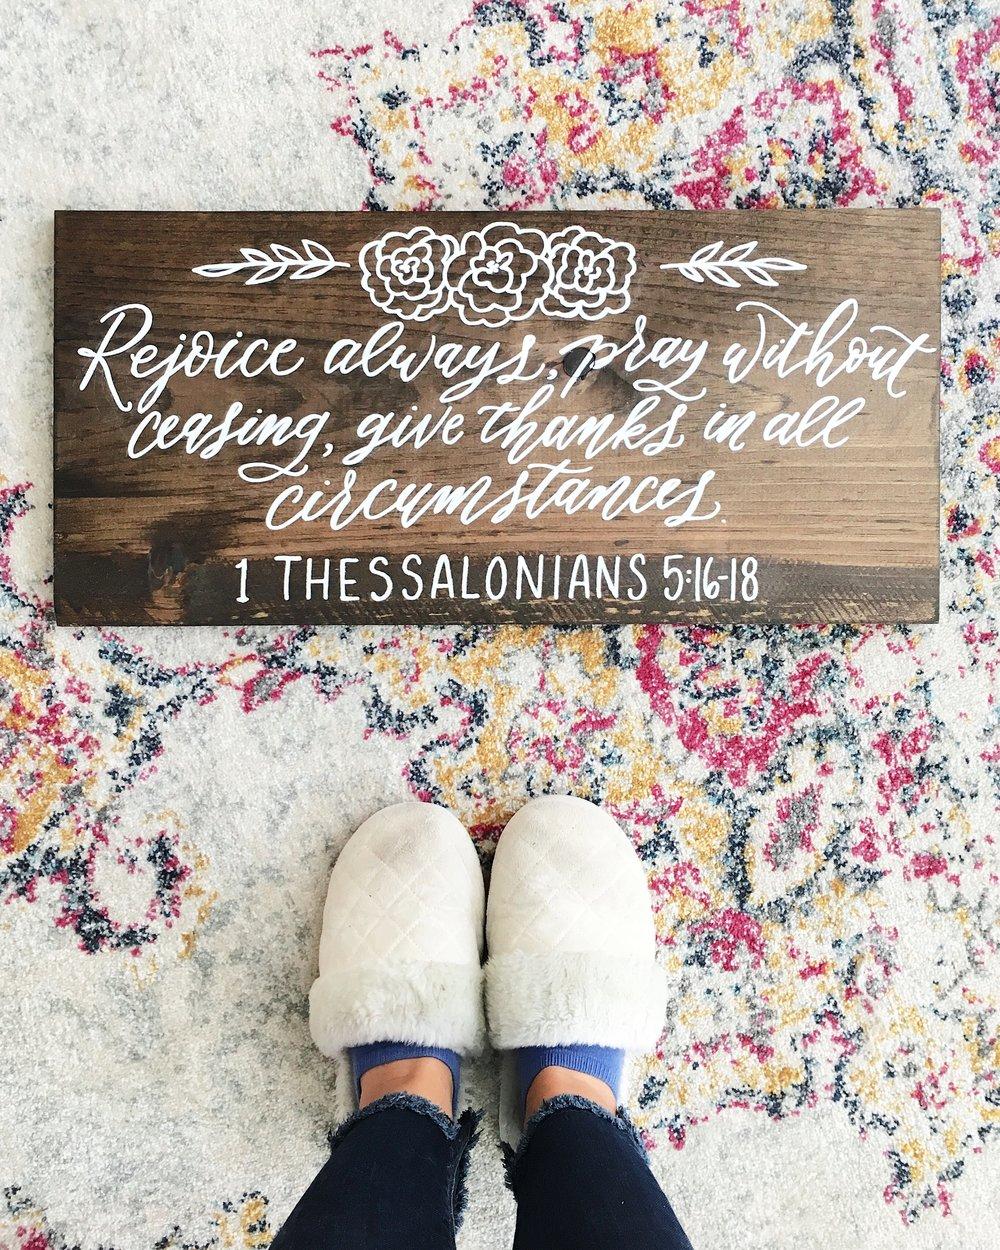 bible verse wood sign, custom wood sign, custom wedding sign, wood wedding sign